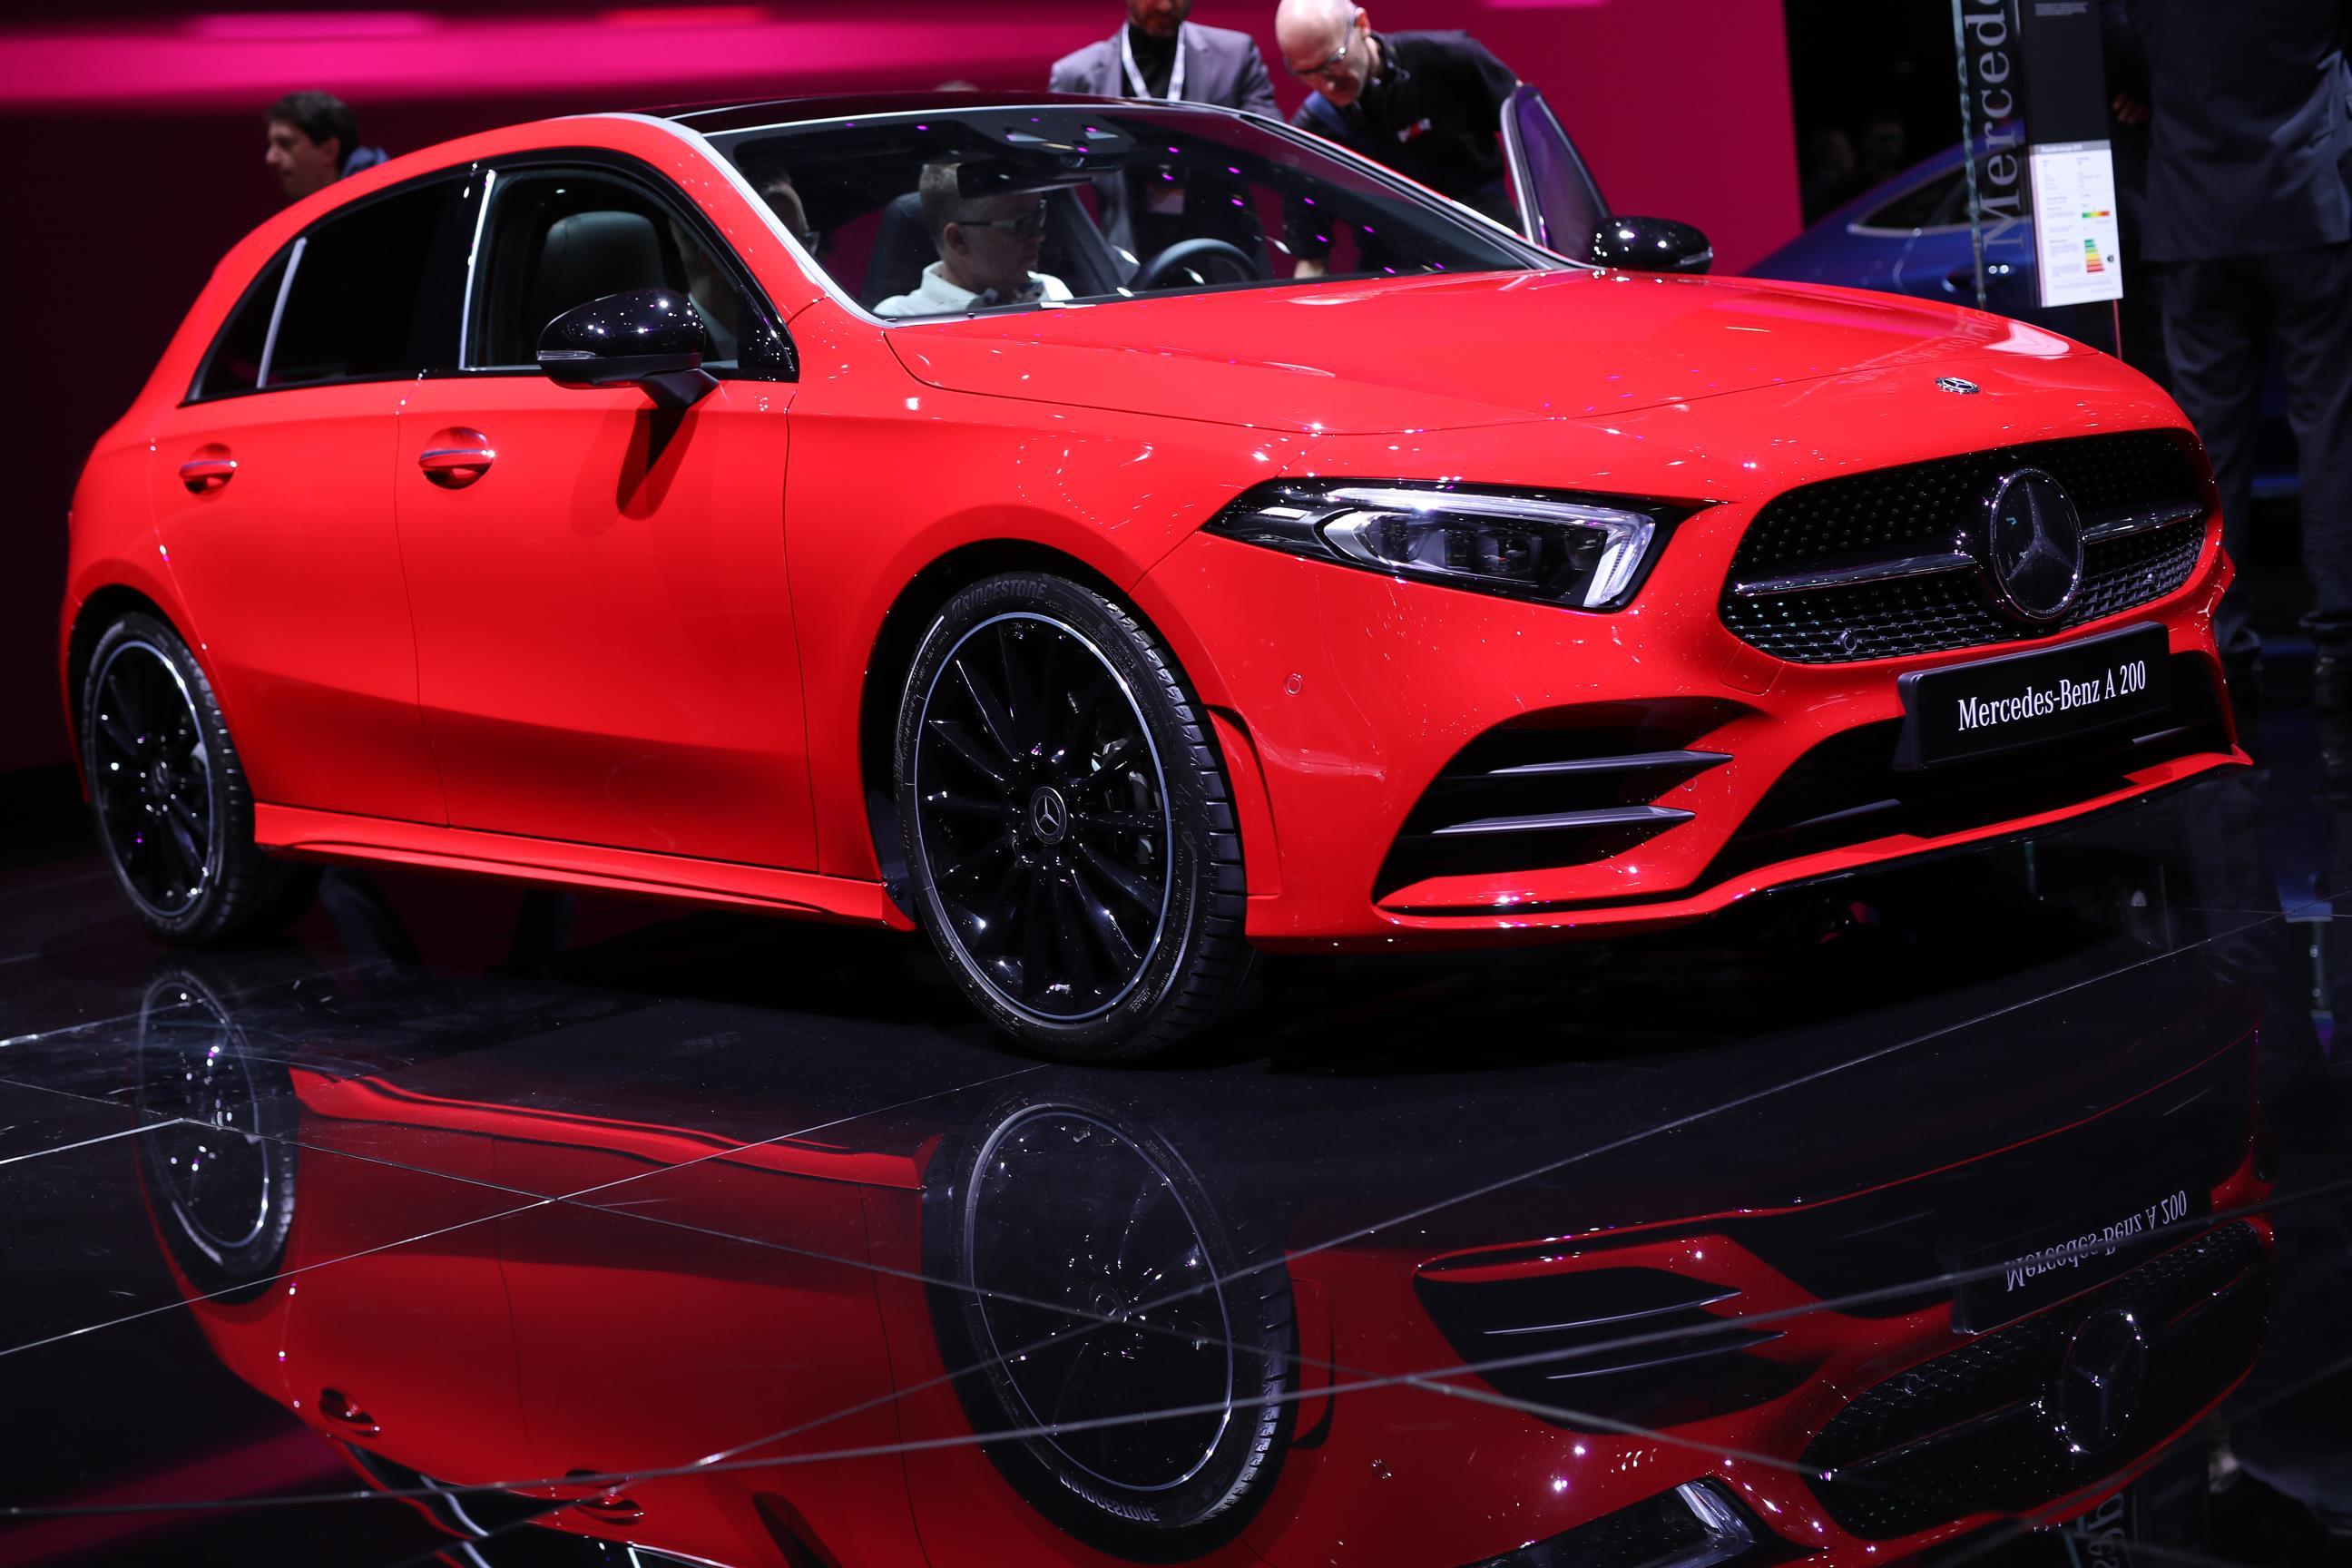 Geneva Motor Show 2018 Mega Gallery Part 2 (344)